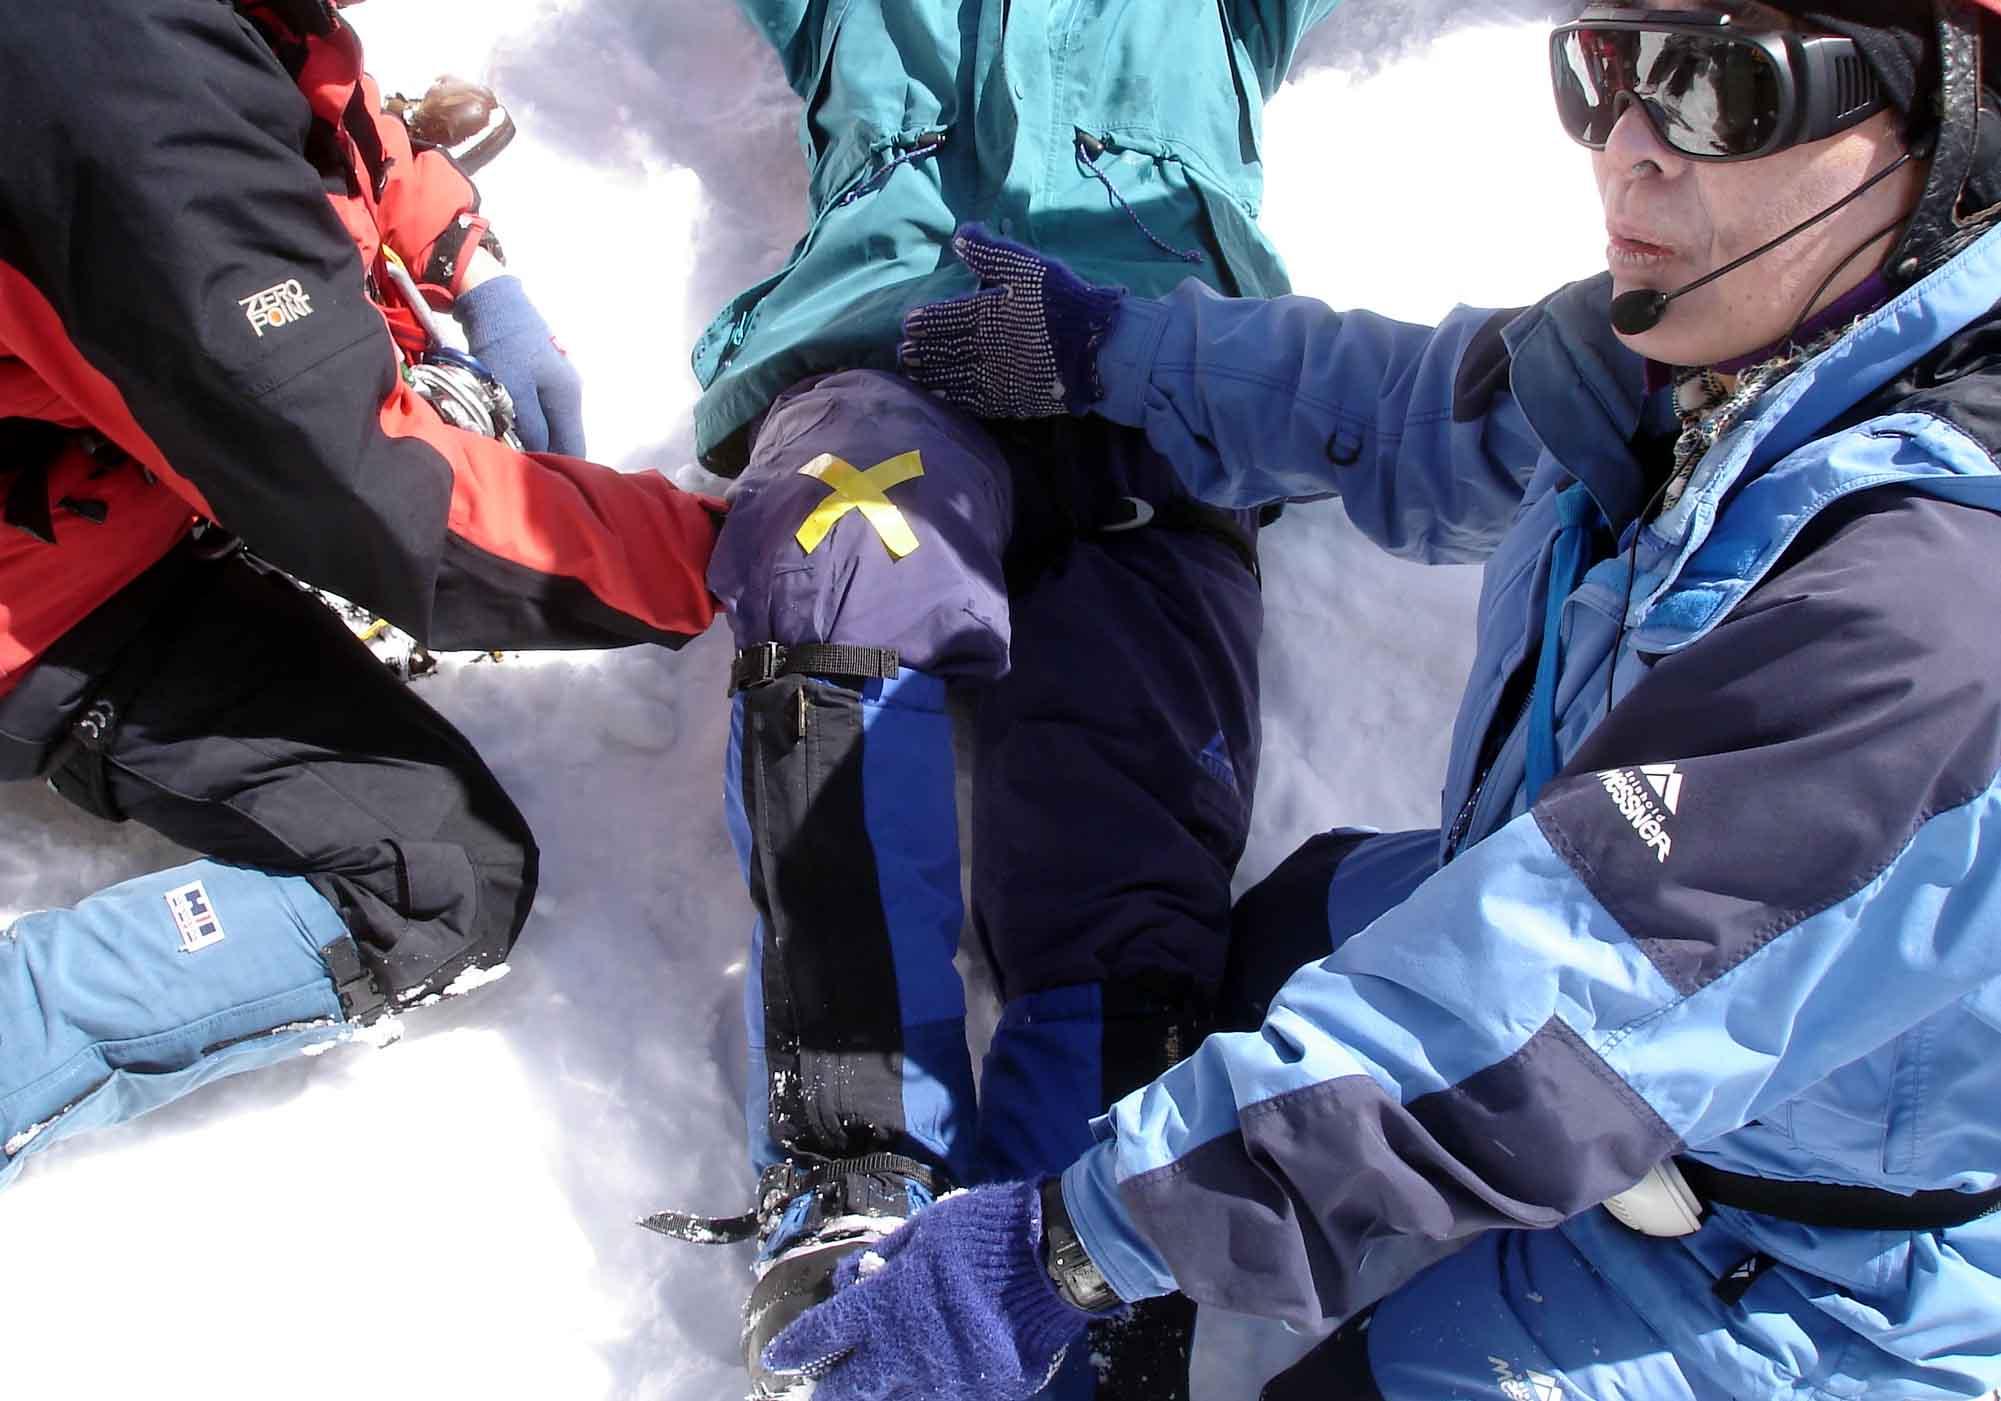 Dsc00307 初動捜索シュミレーション140(大村講師より膝部の骨折処置法を教授)